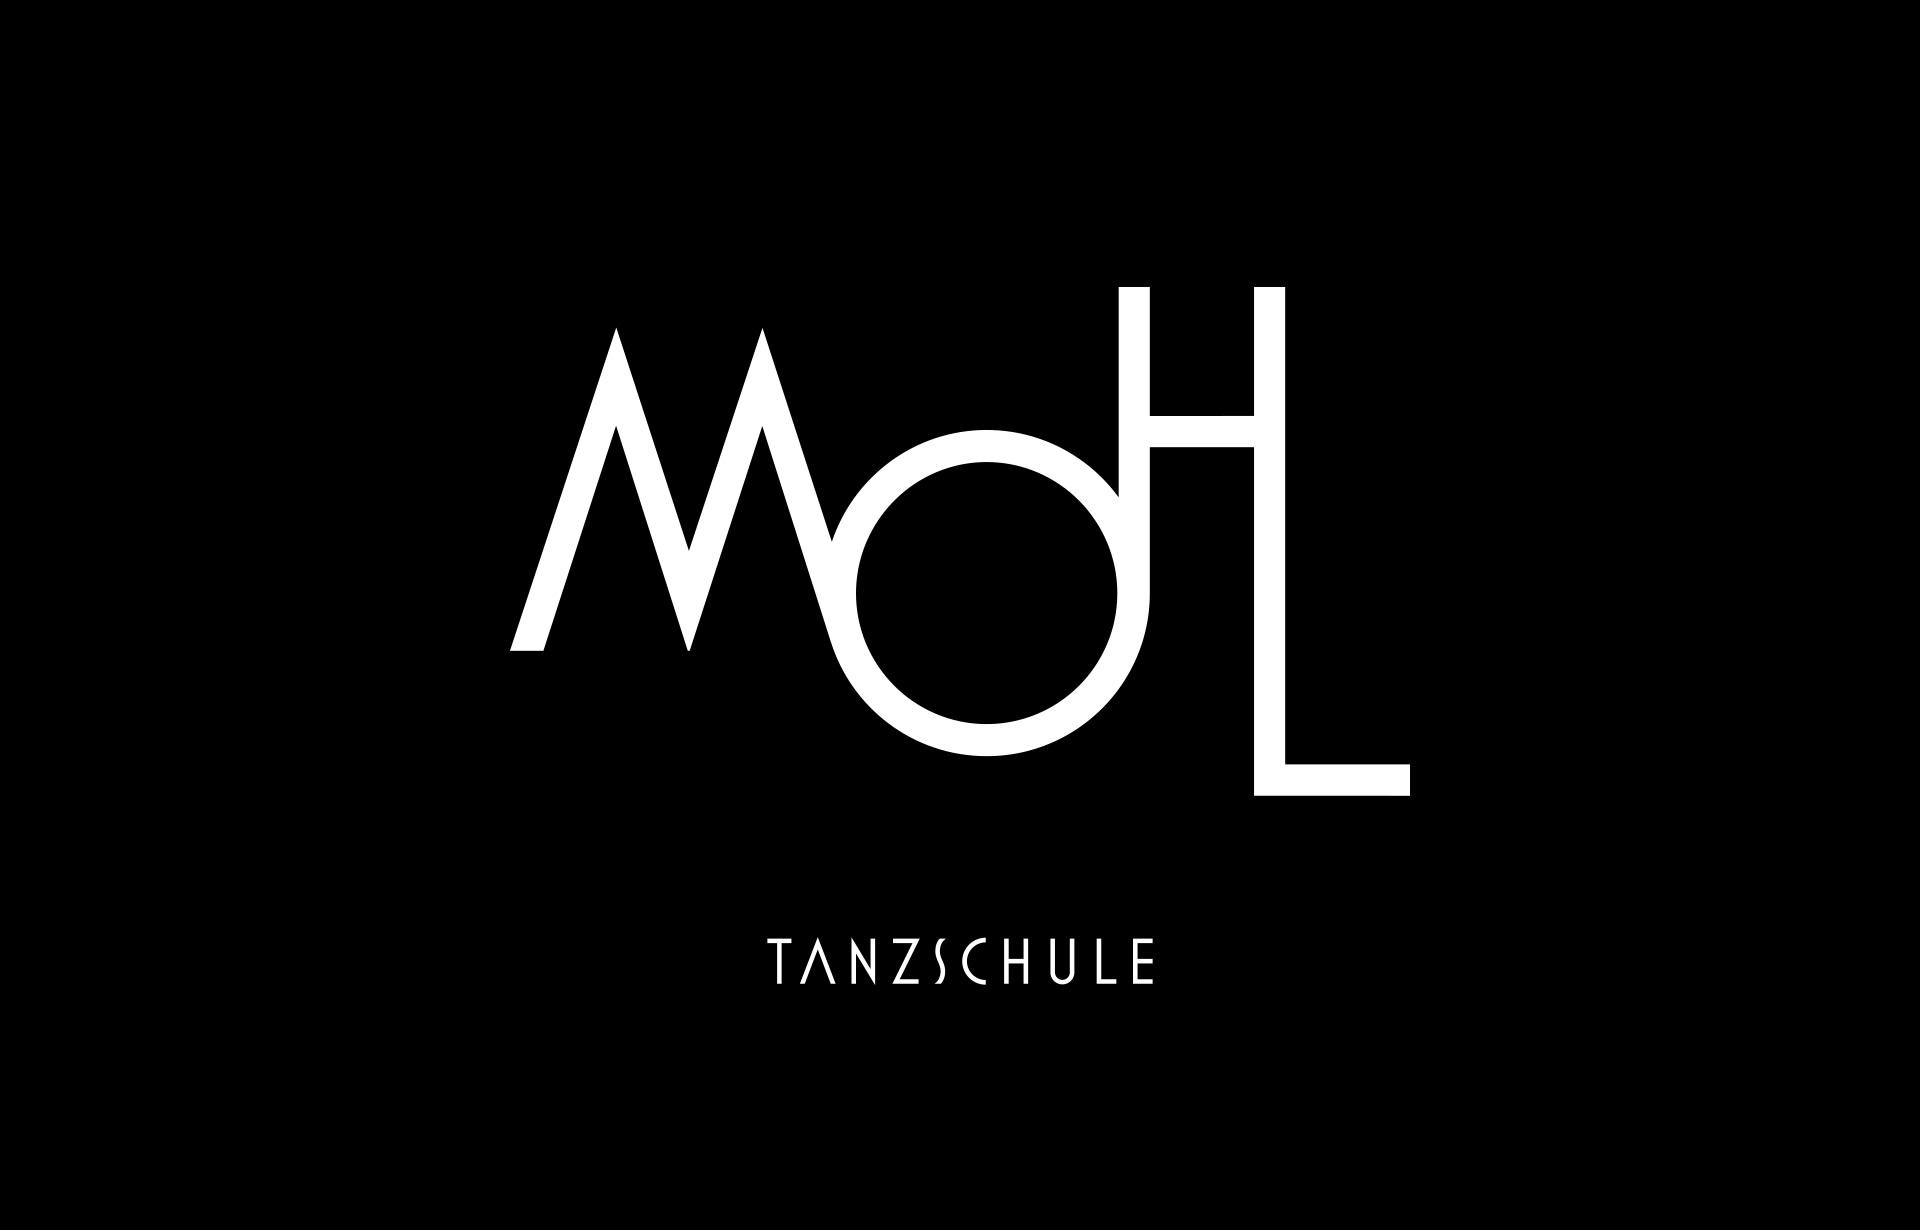 mohl_tanzschule_logo_negativ